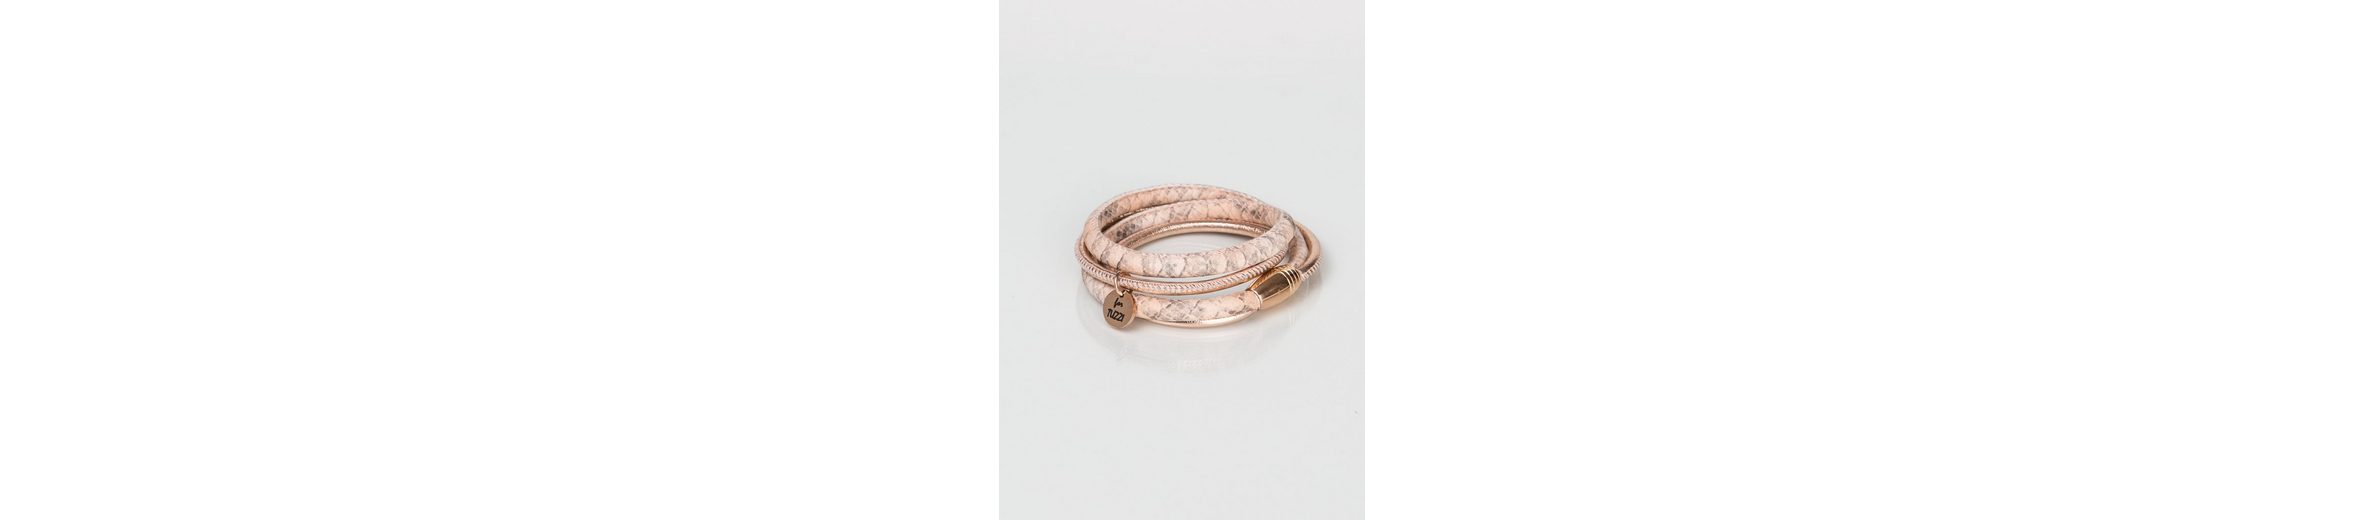 TUZZI Wickelarmband mit Magnetverschluss